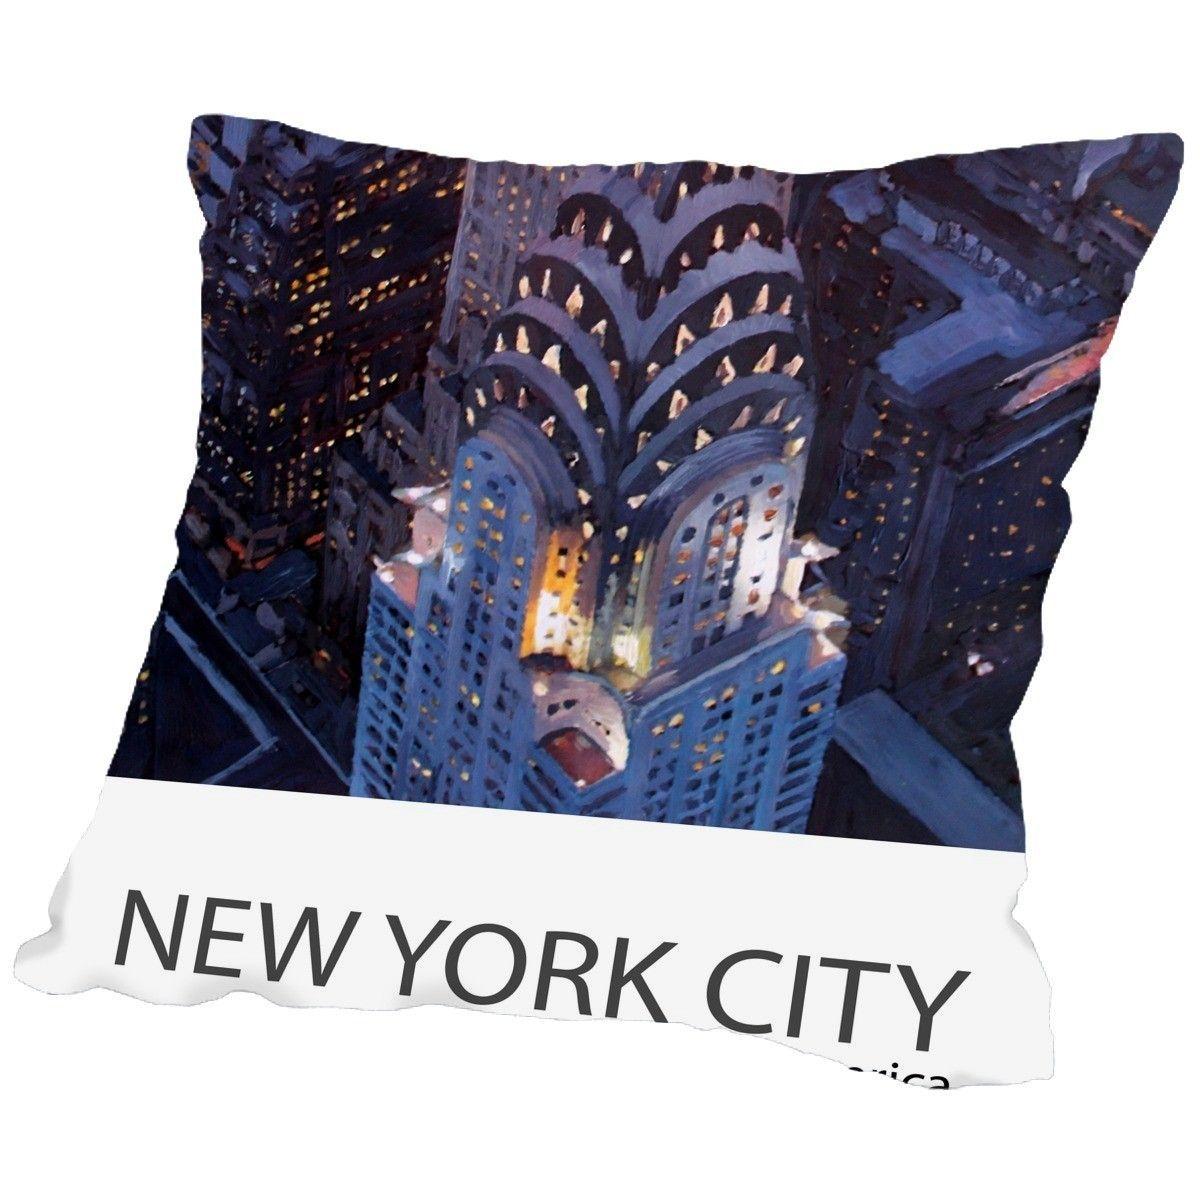 New York City Classical Midtown Manhattan with Chrysler Building Poster Throw Pillow